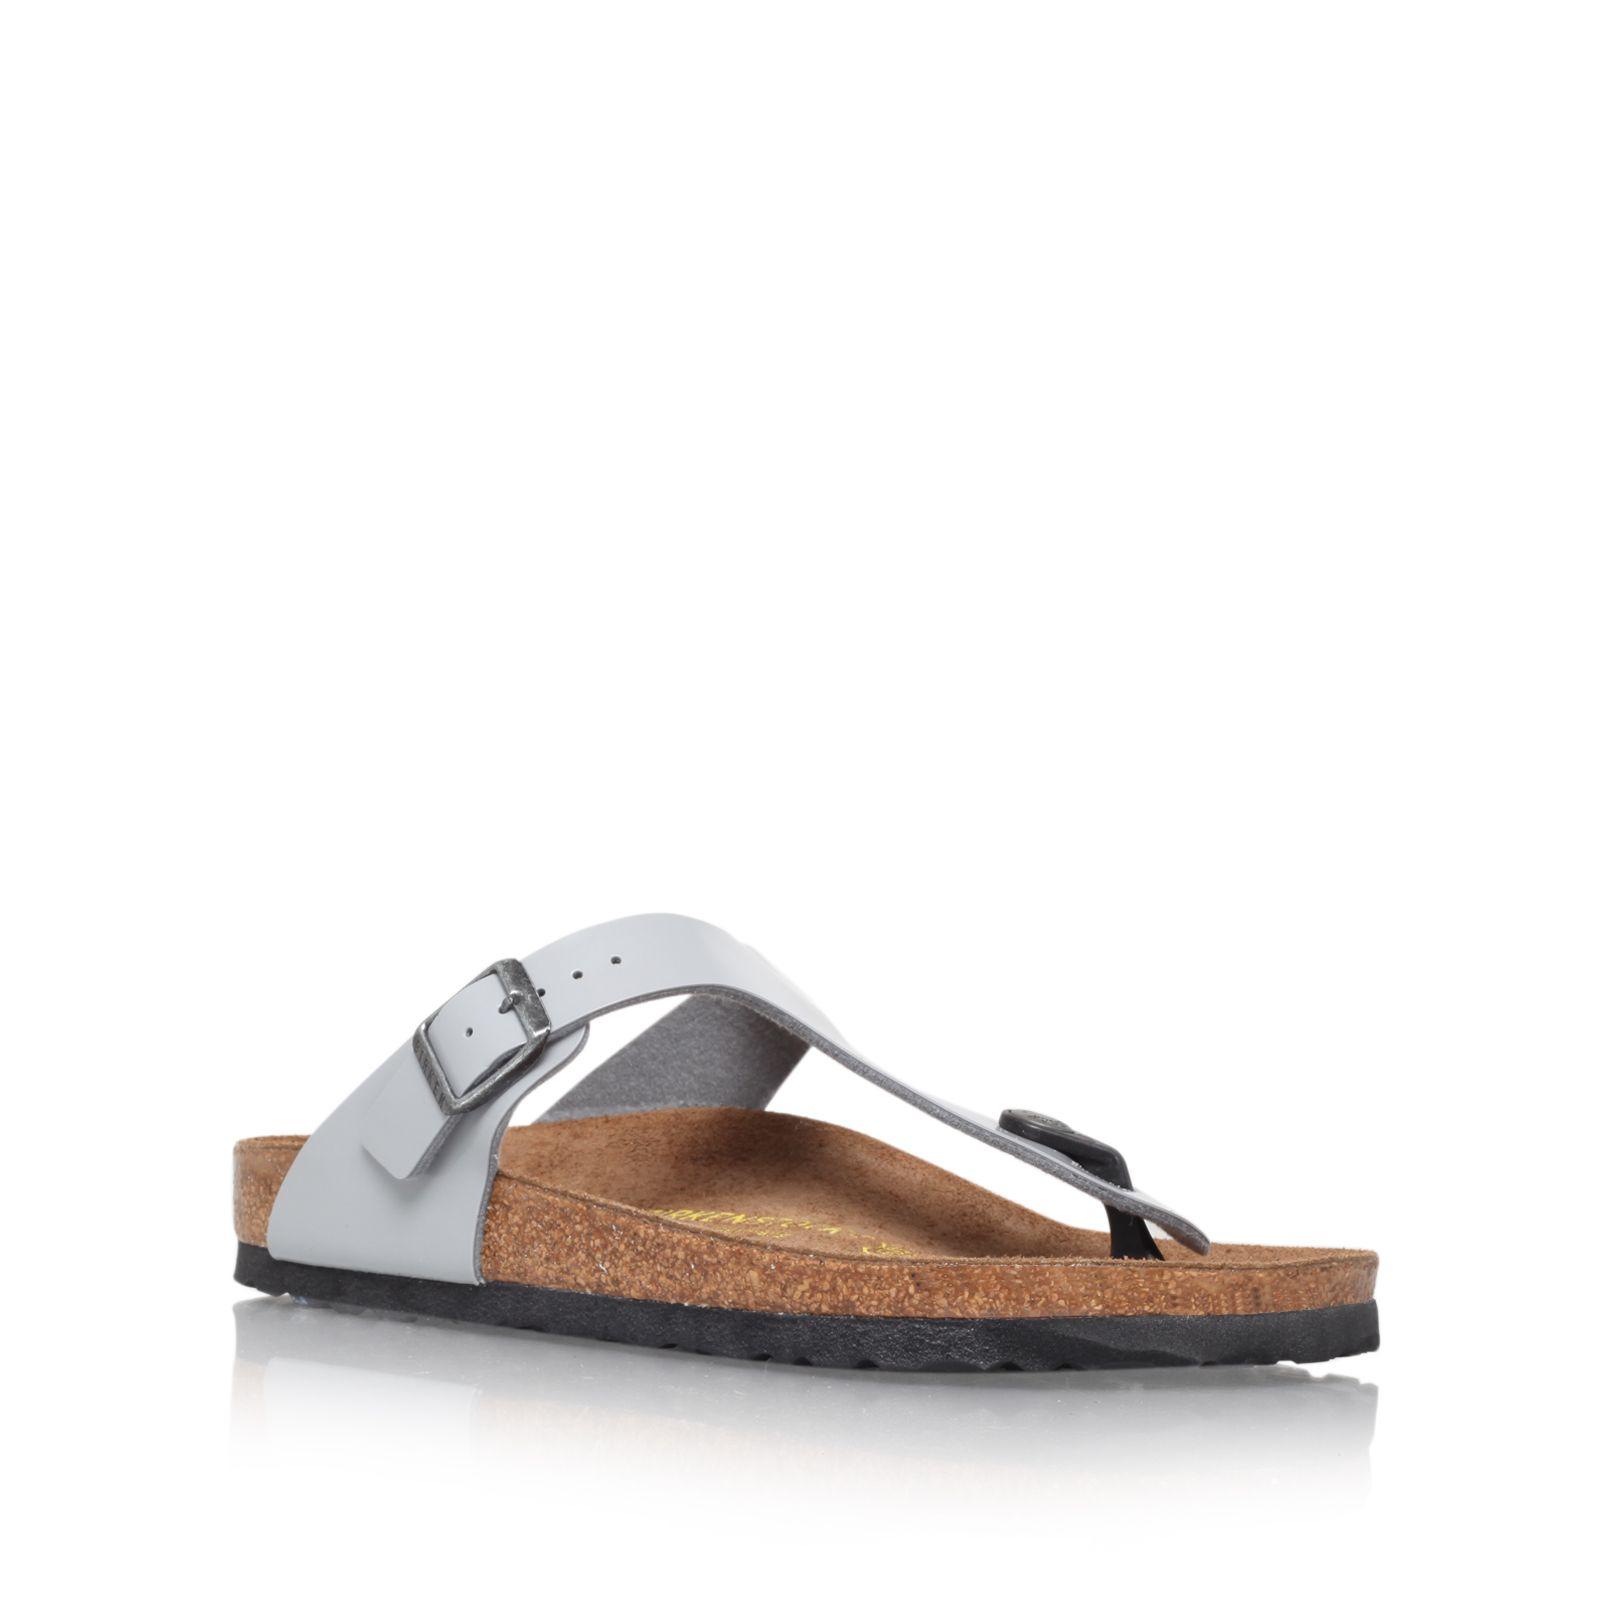 Birkenstock Gizeh Leather T Bar Sandals In Metallic Lyst